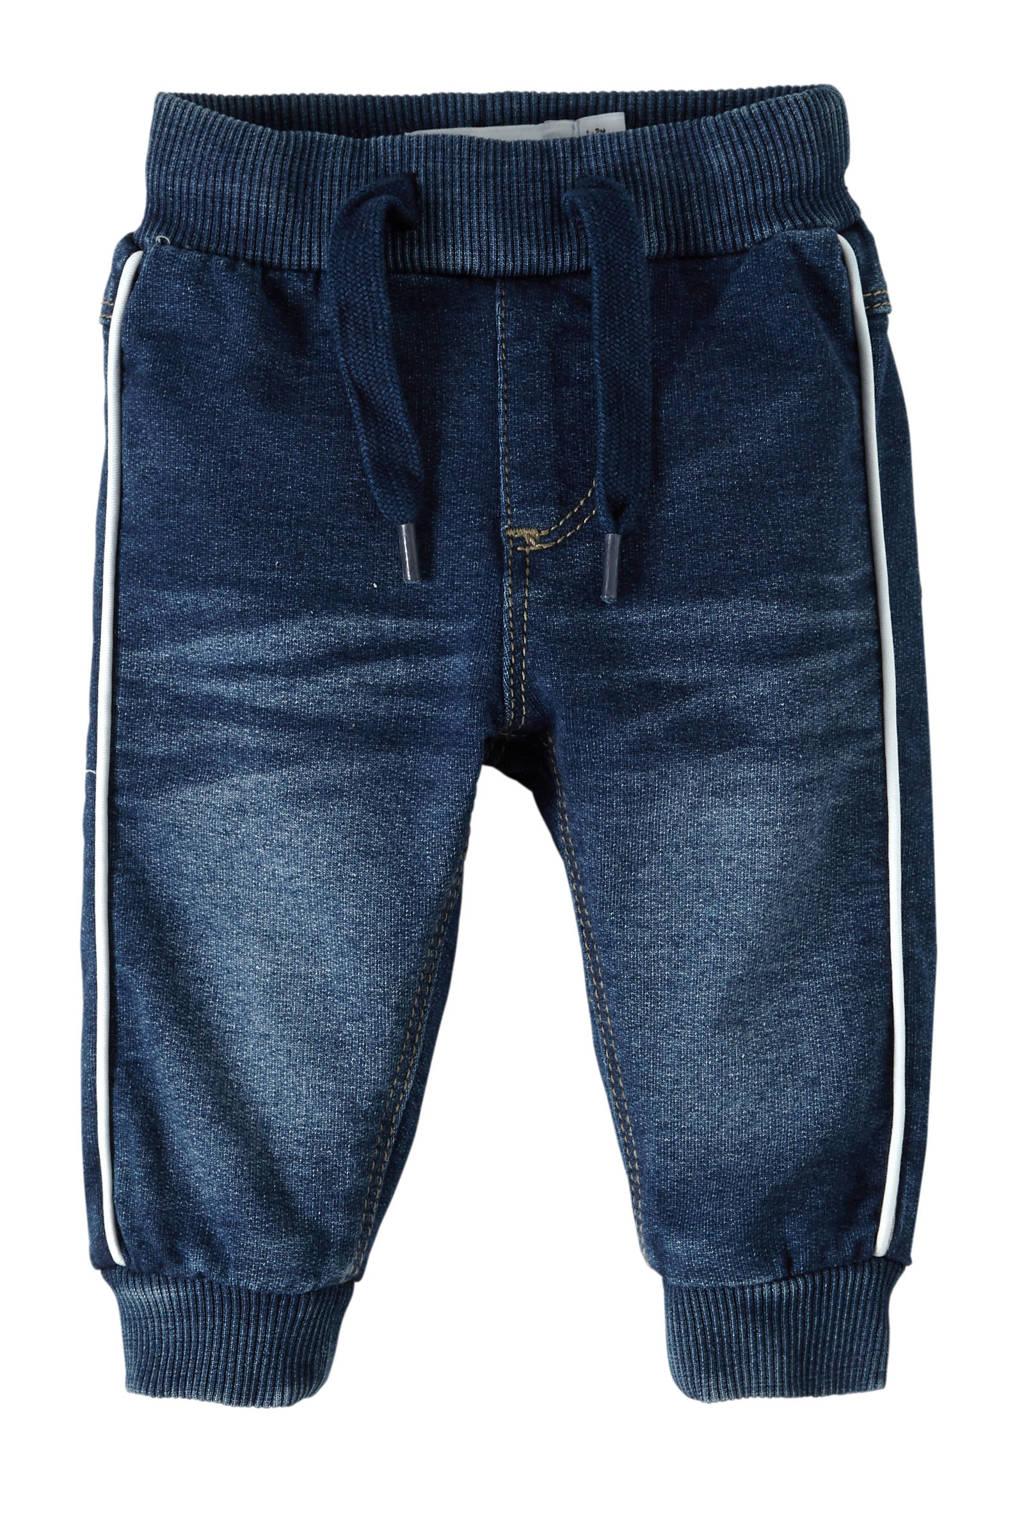 name it BABY loose fit jeans, Dark blue denim